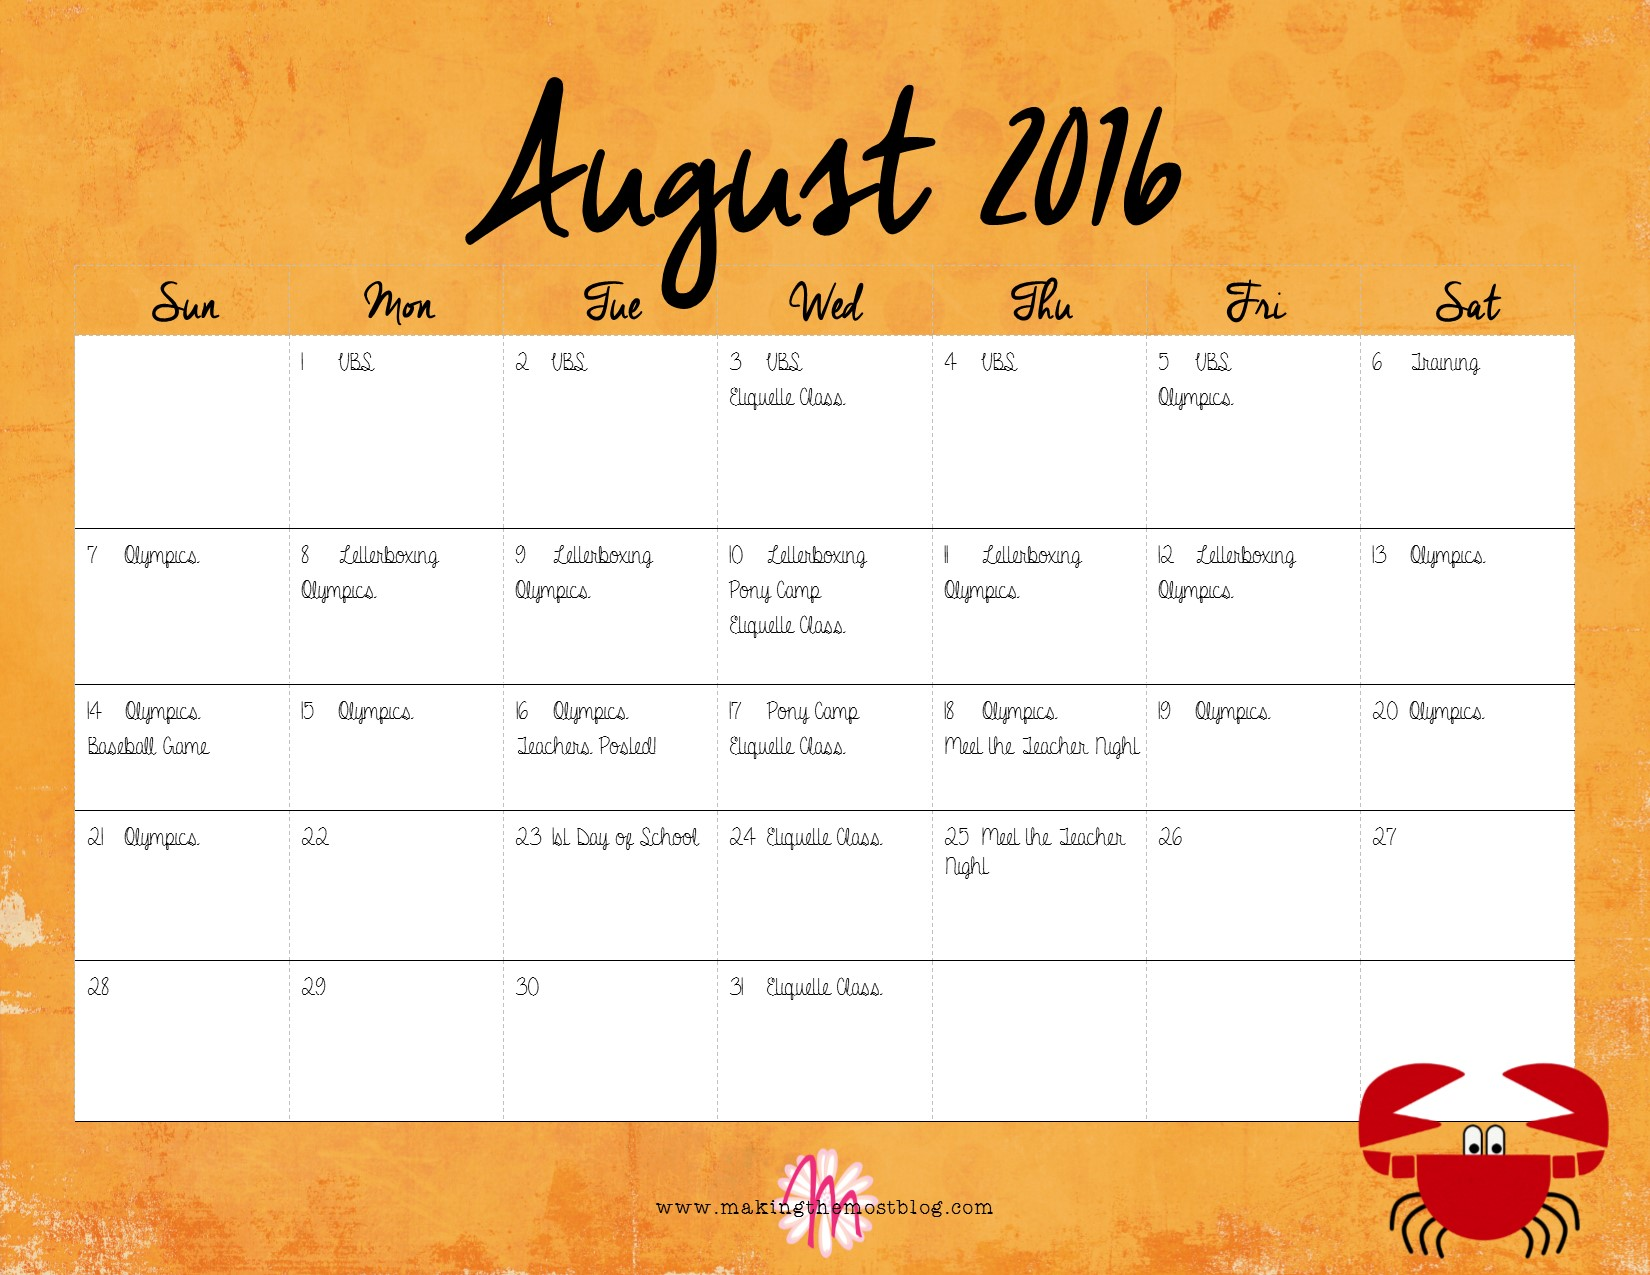 August 2016 (FREE Printable!) Super Summer Calendar | Making the Most Blog